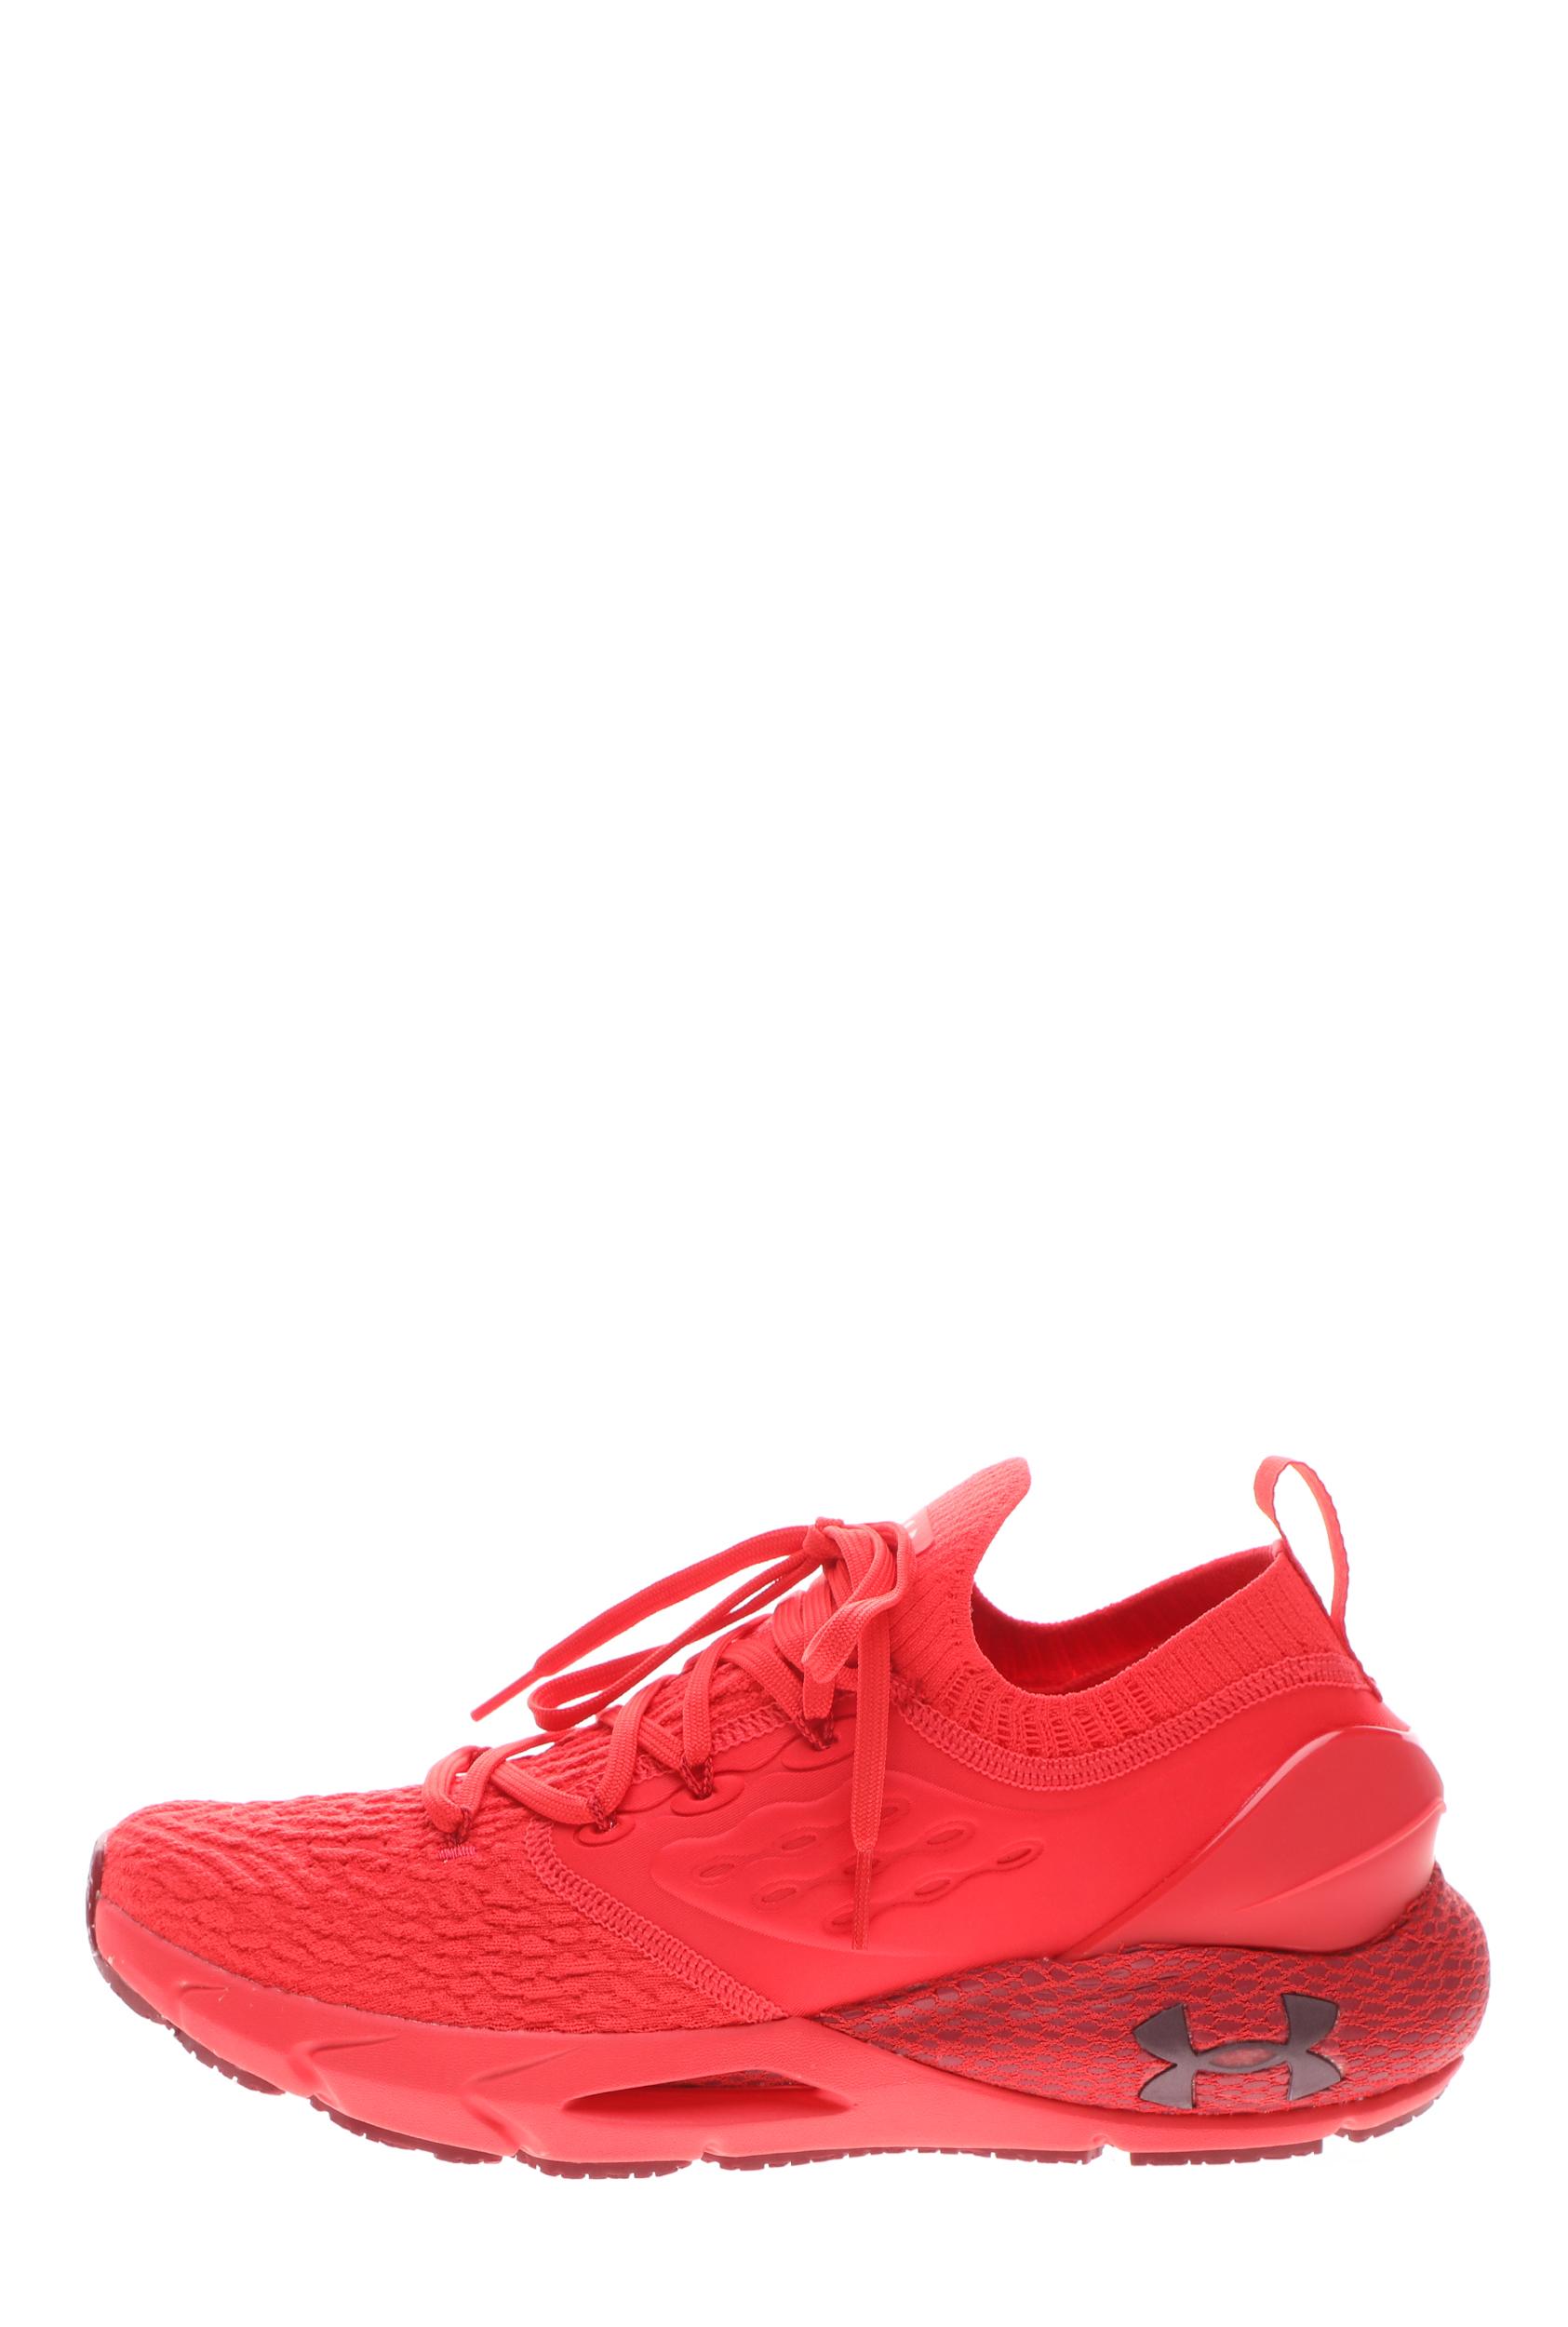 UNDER ARMOUR – Ανδρικά αθλητικά παπούτσια UA HOVR Phantom 2 κόκκινα